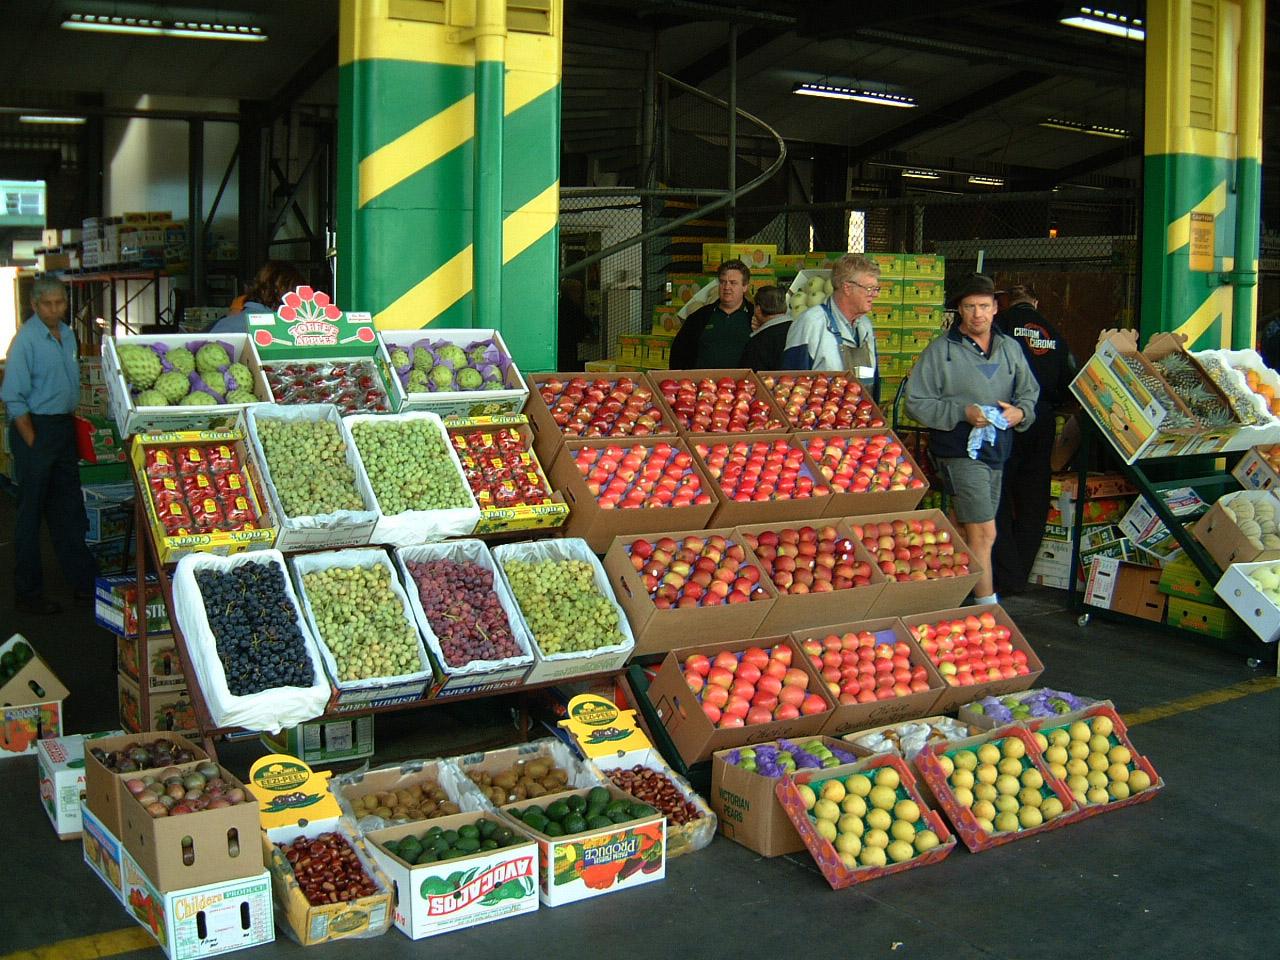 Brisbane Markets Sherwood Road Rocklea Queensland 4106 Jun 2002 I12